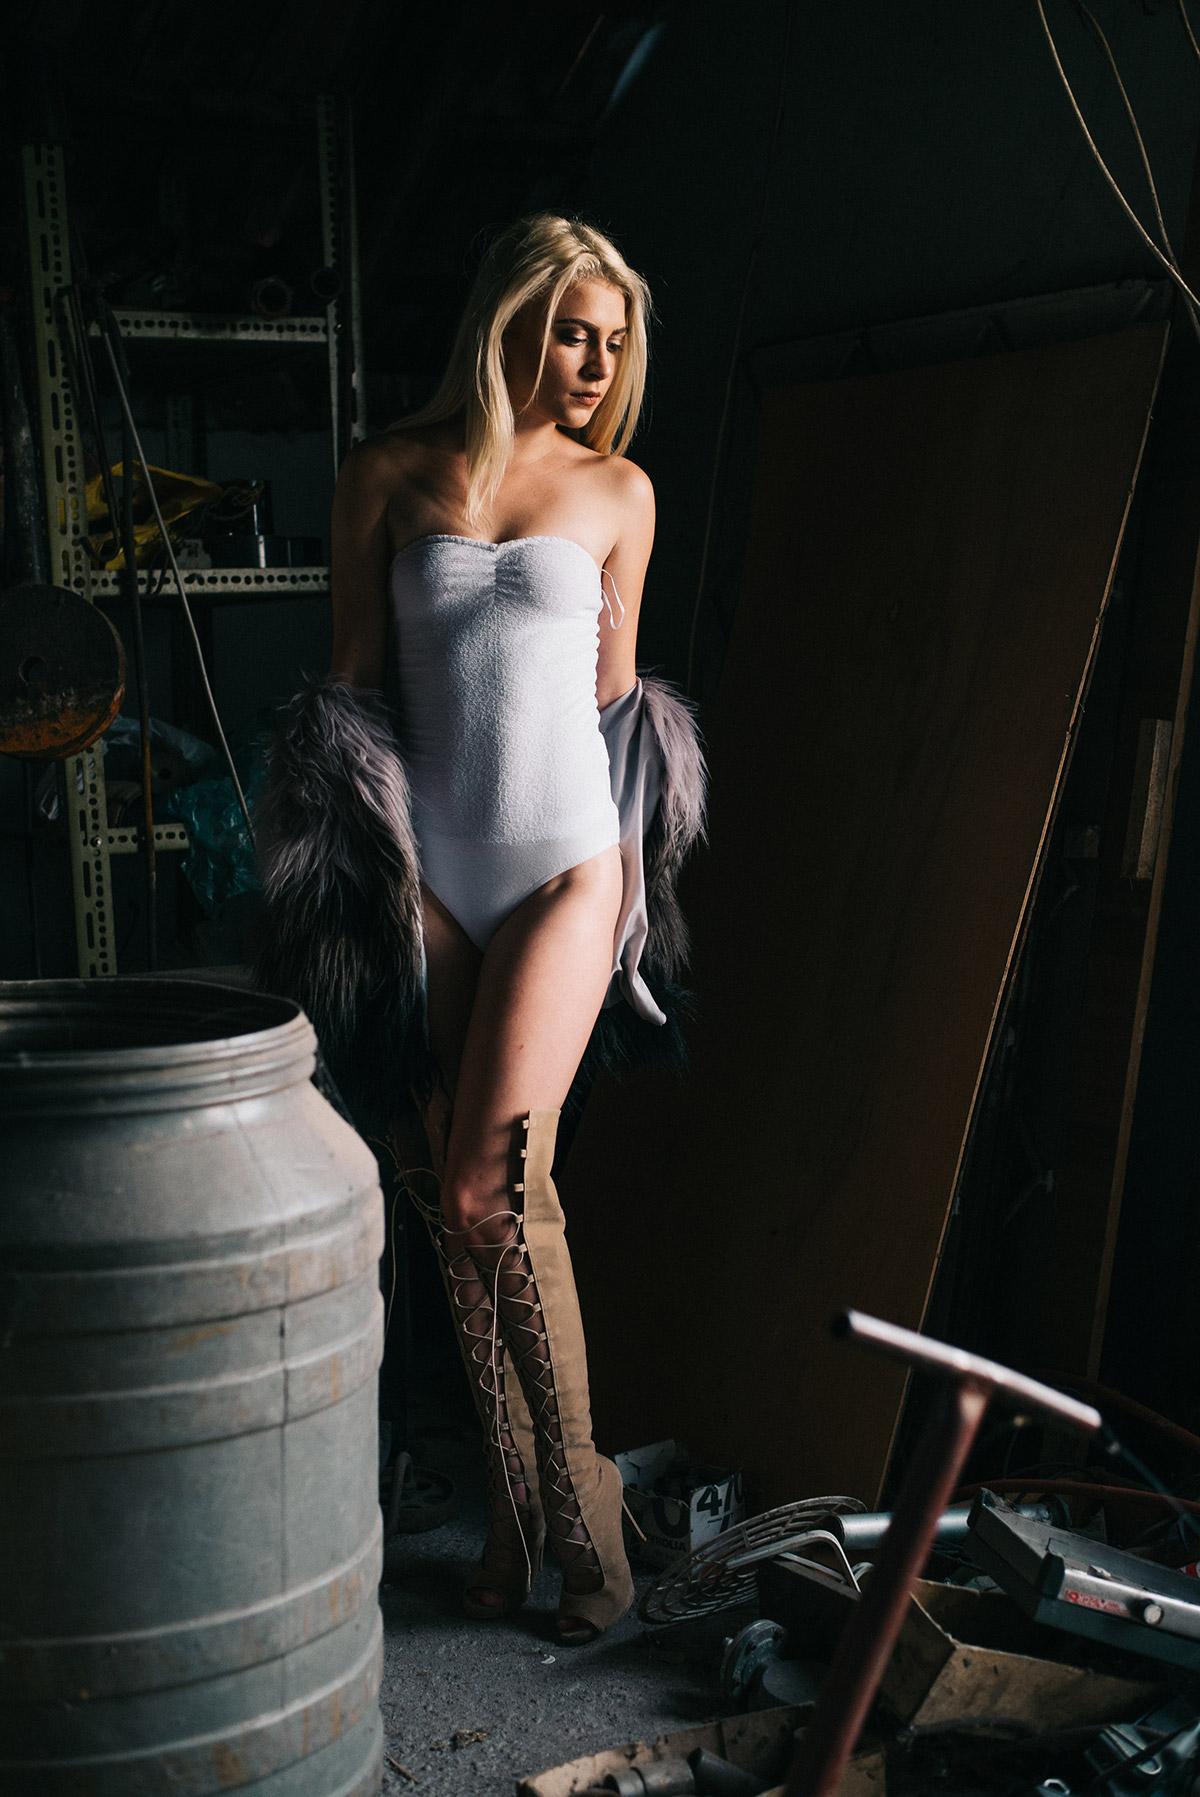 fotograf-bojan-sokolovic-fashion-model-19